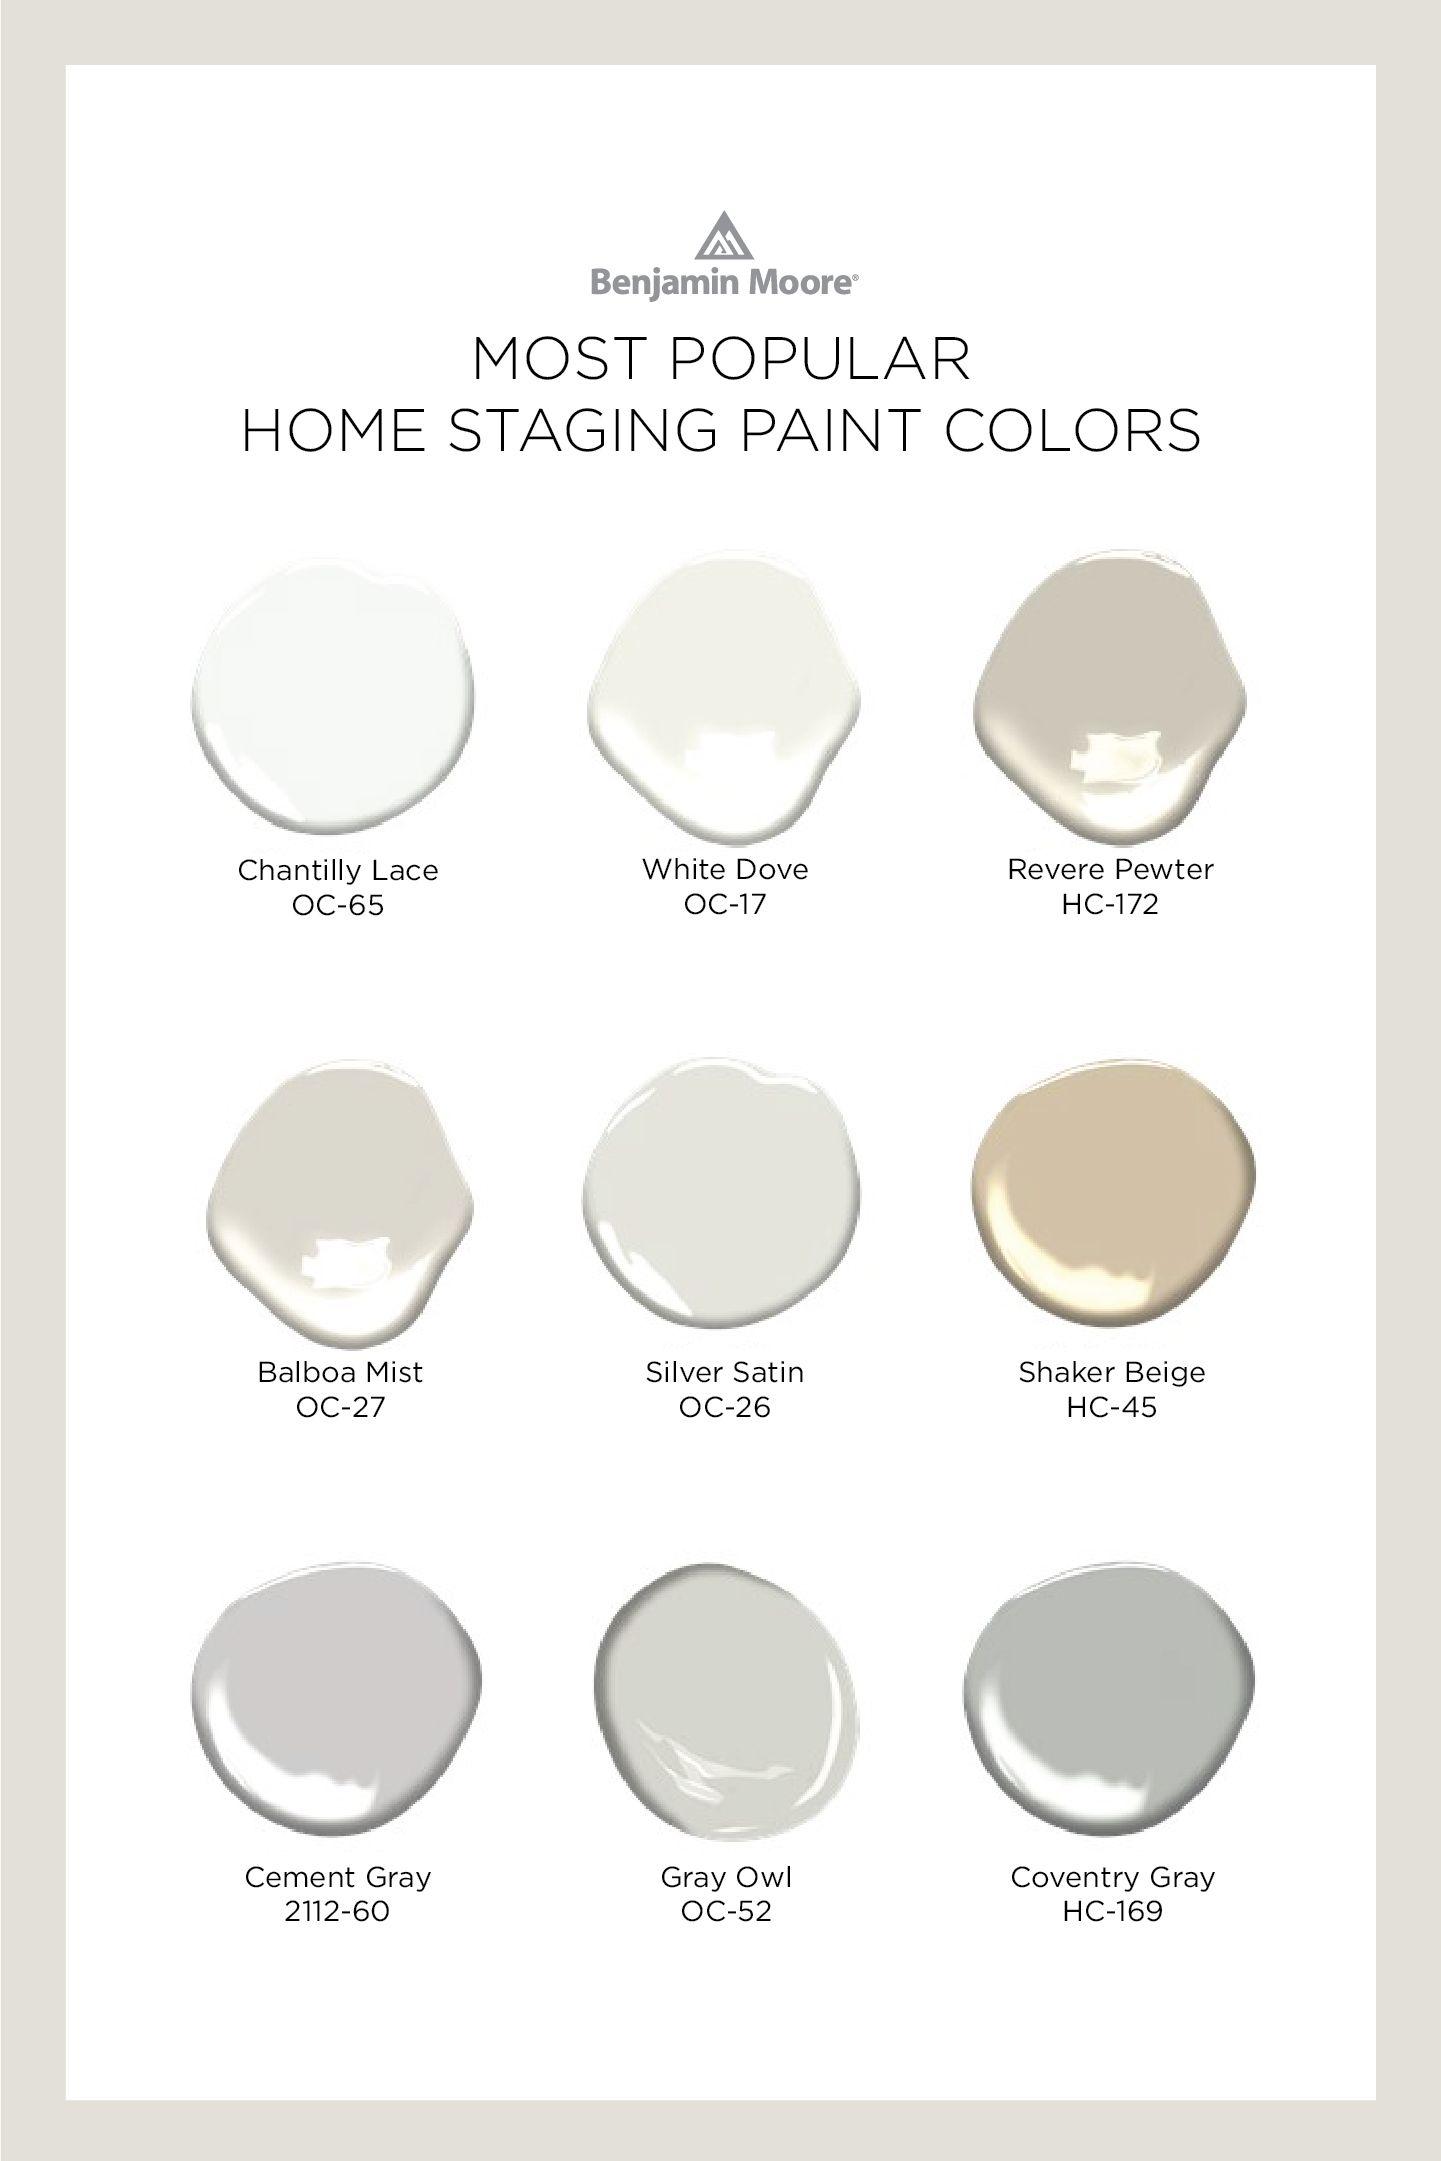 Most Popular Paint Colors Benjamin Moore Popular Kitchen Colors Paint Colors For Home Benjamin Moore Colors Benjamin moore kitchen colors